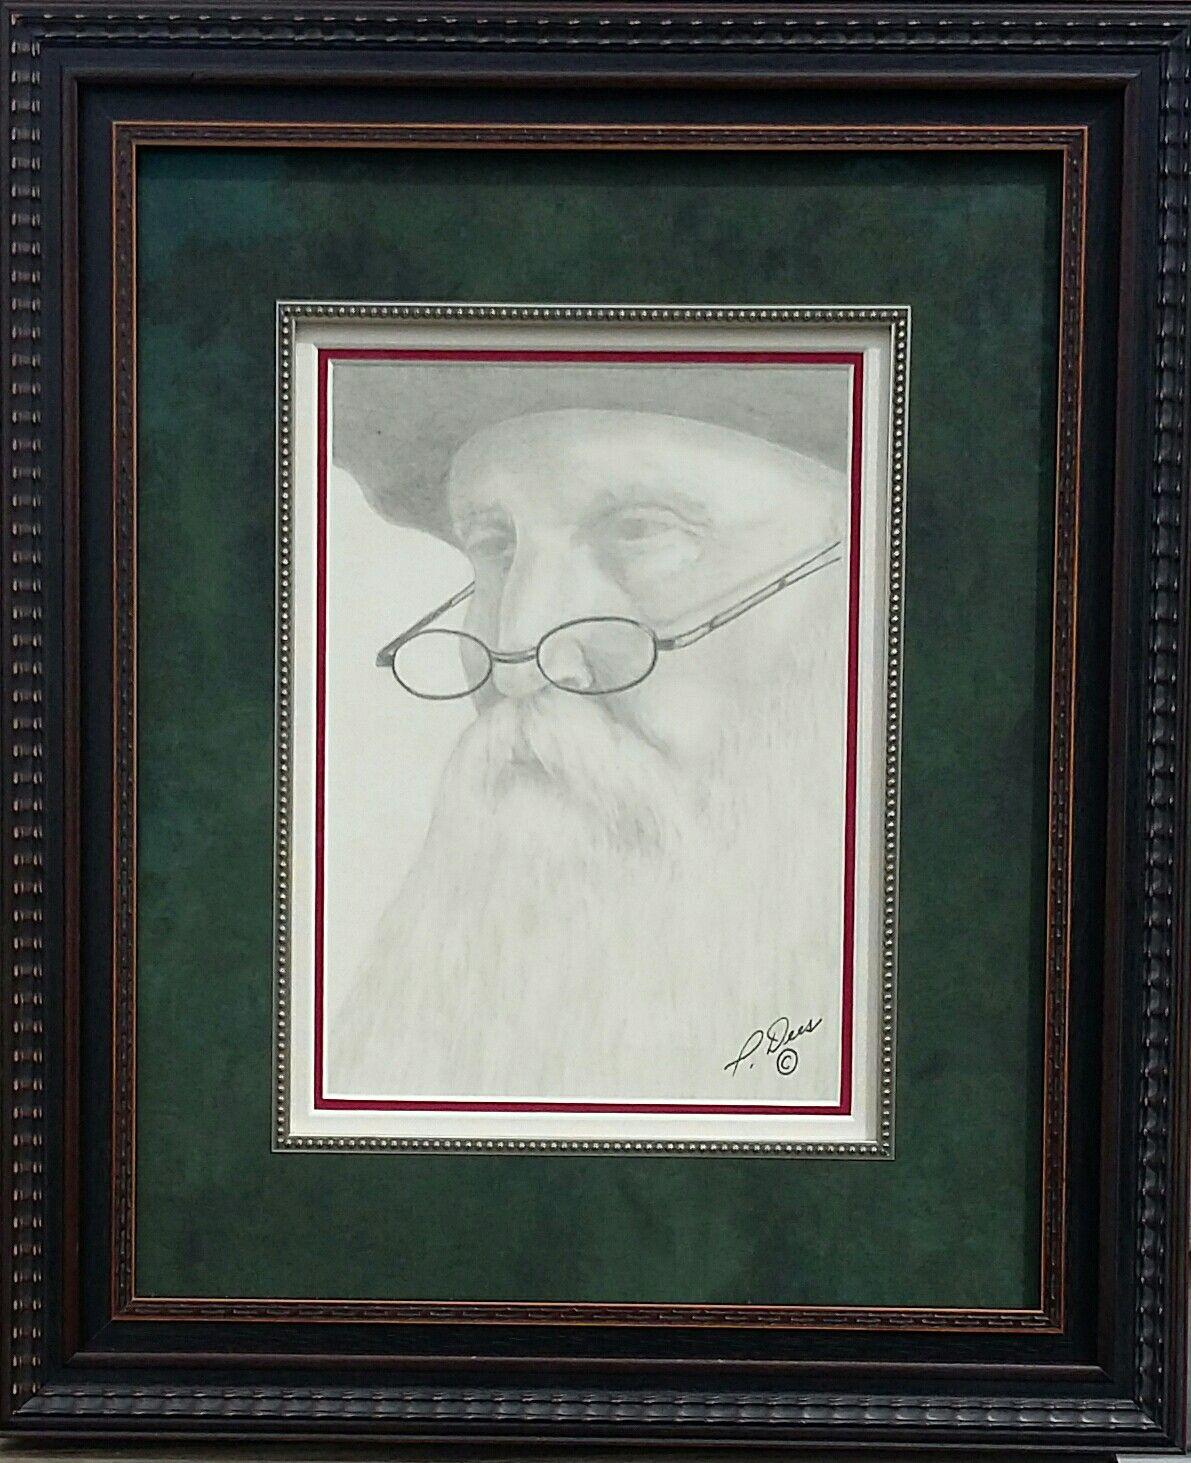 Self Portrait With Glasses By The Artist Preston Les